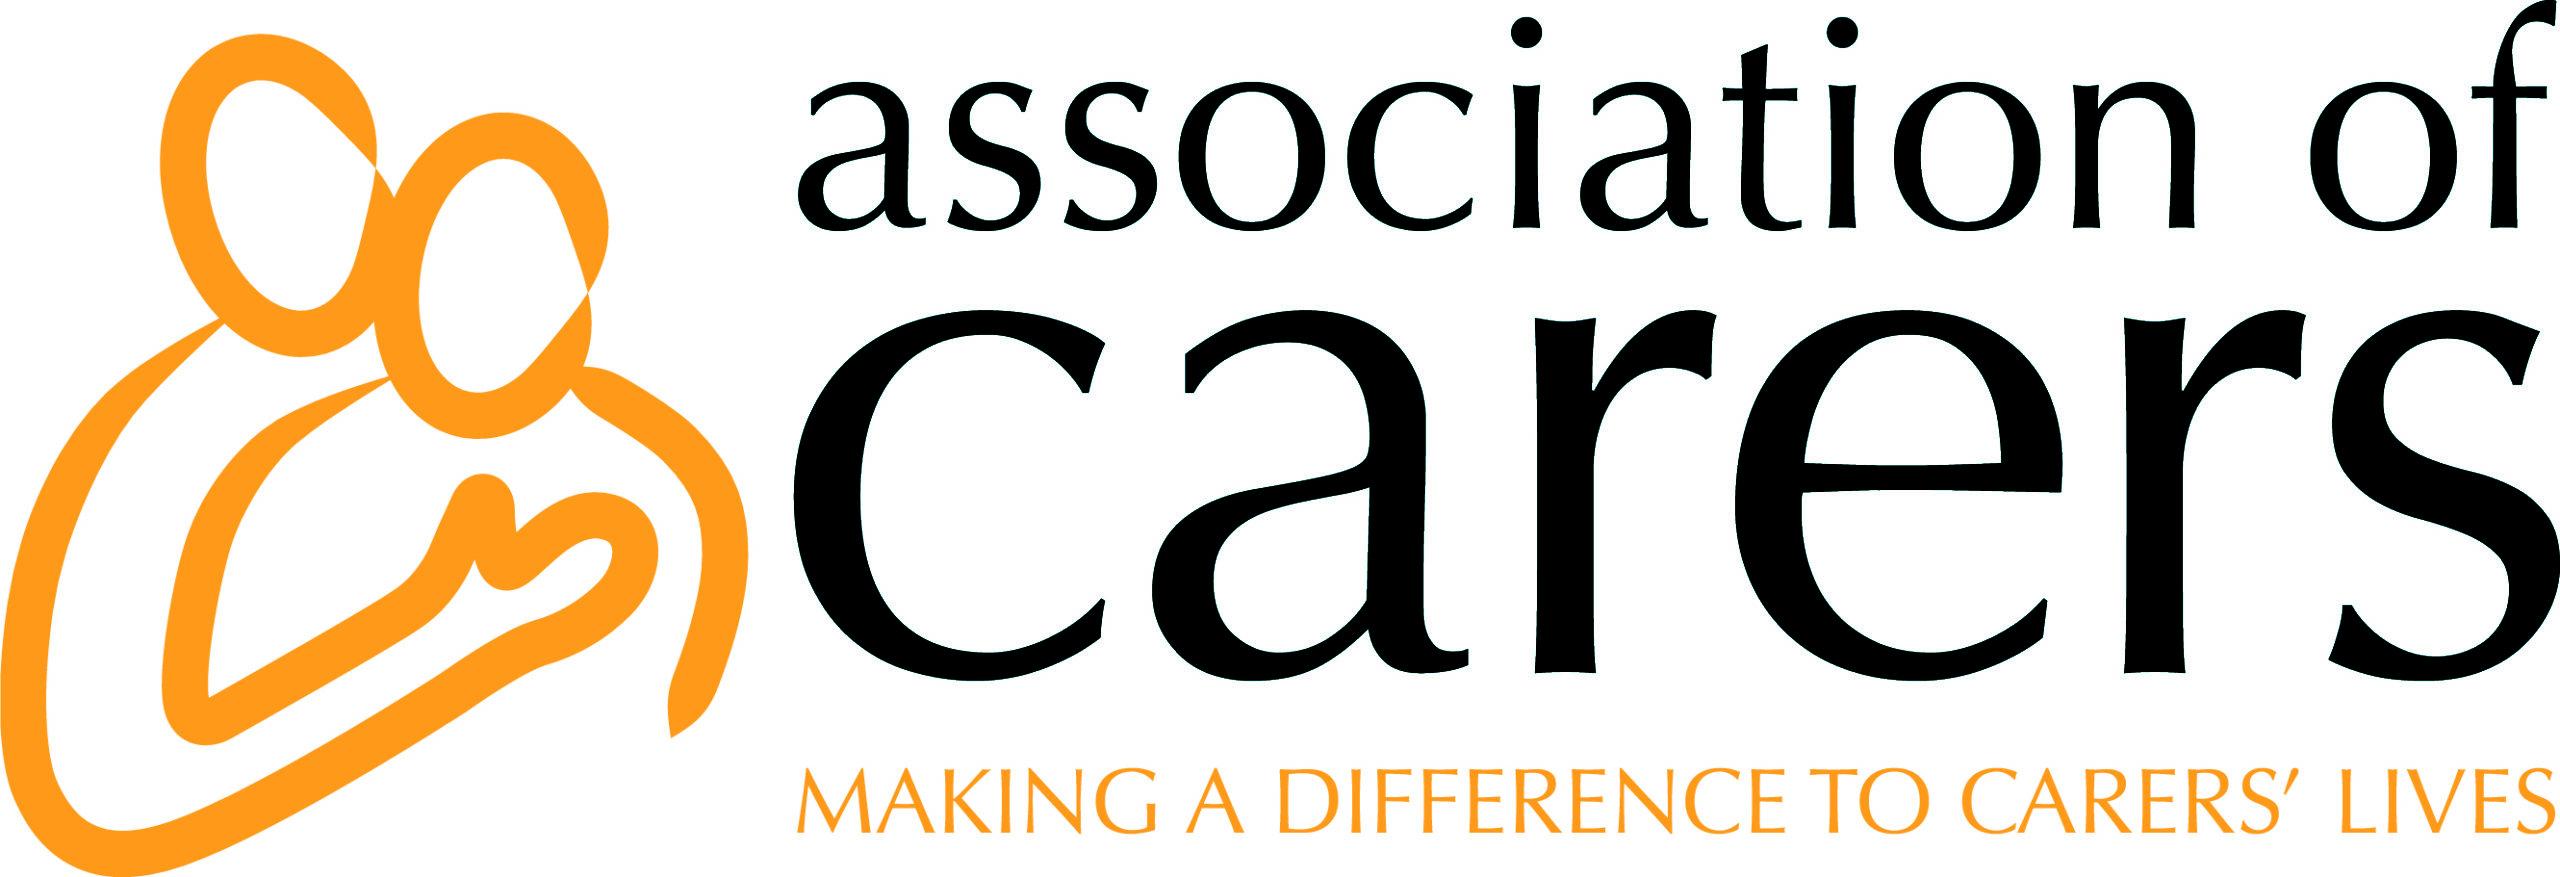 Association of Carers logo